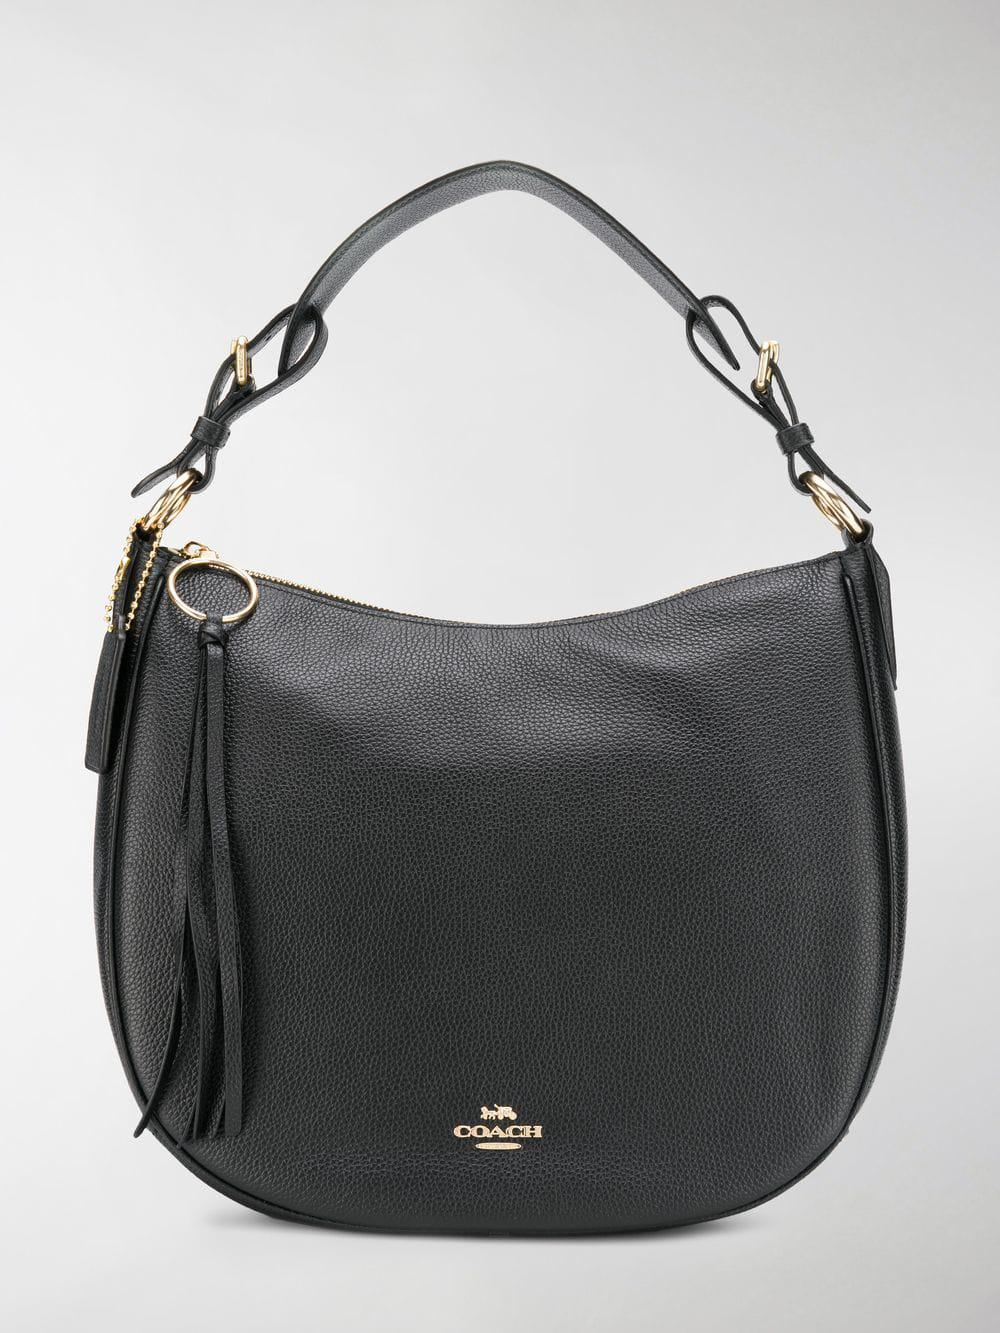 c0e0cf813fe86e COACH Sutton Hobo Bag in Black - Lyst